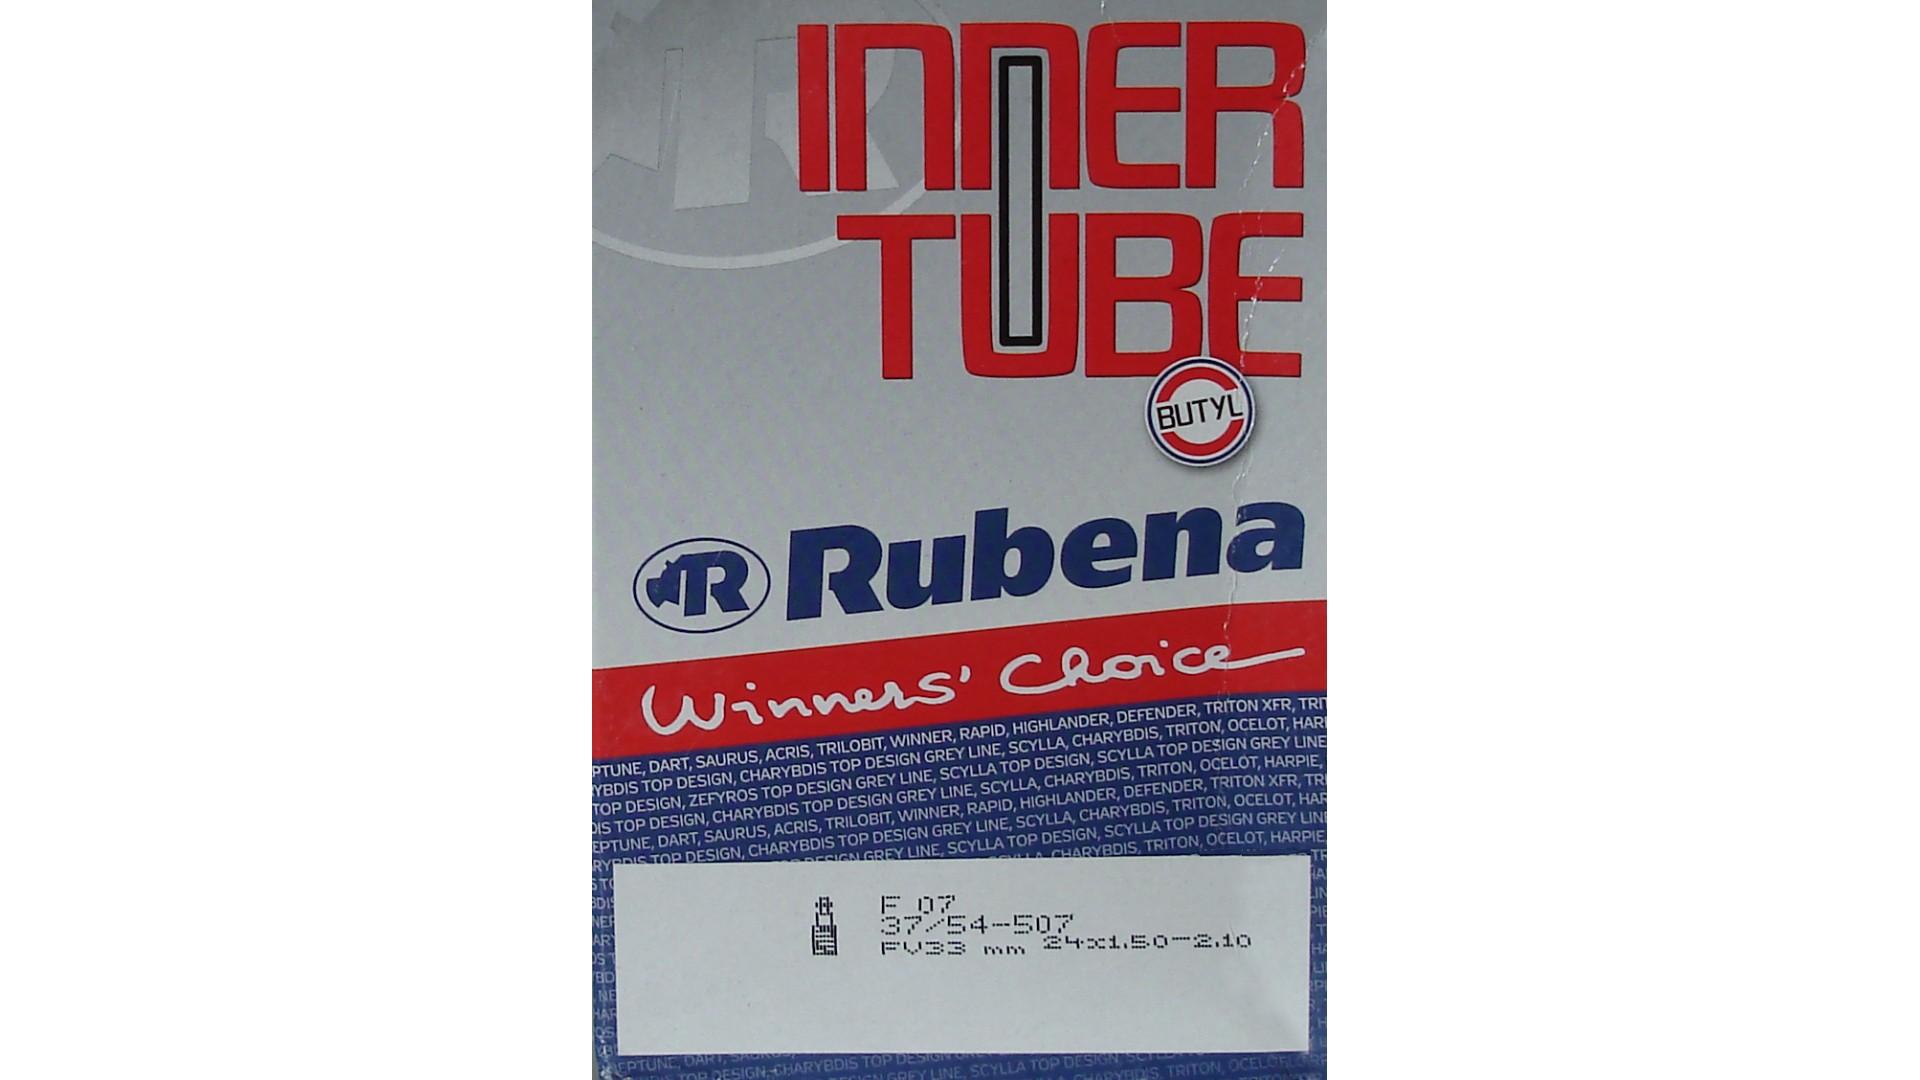 Камера RUBENA 24 x 1,50 - 2,10 FV33 F07